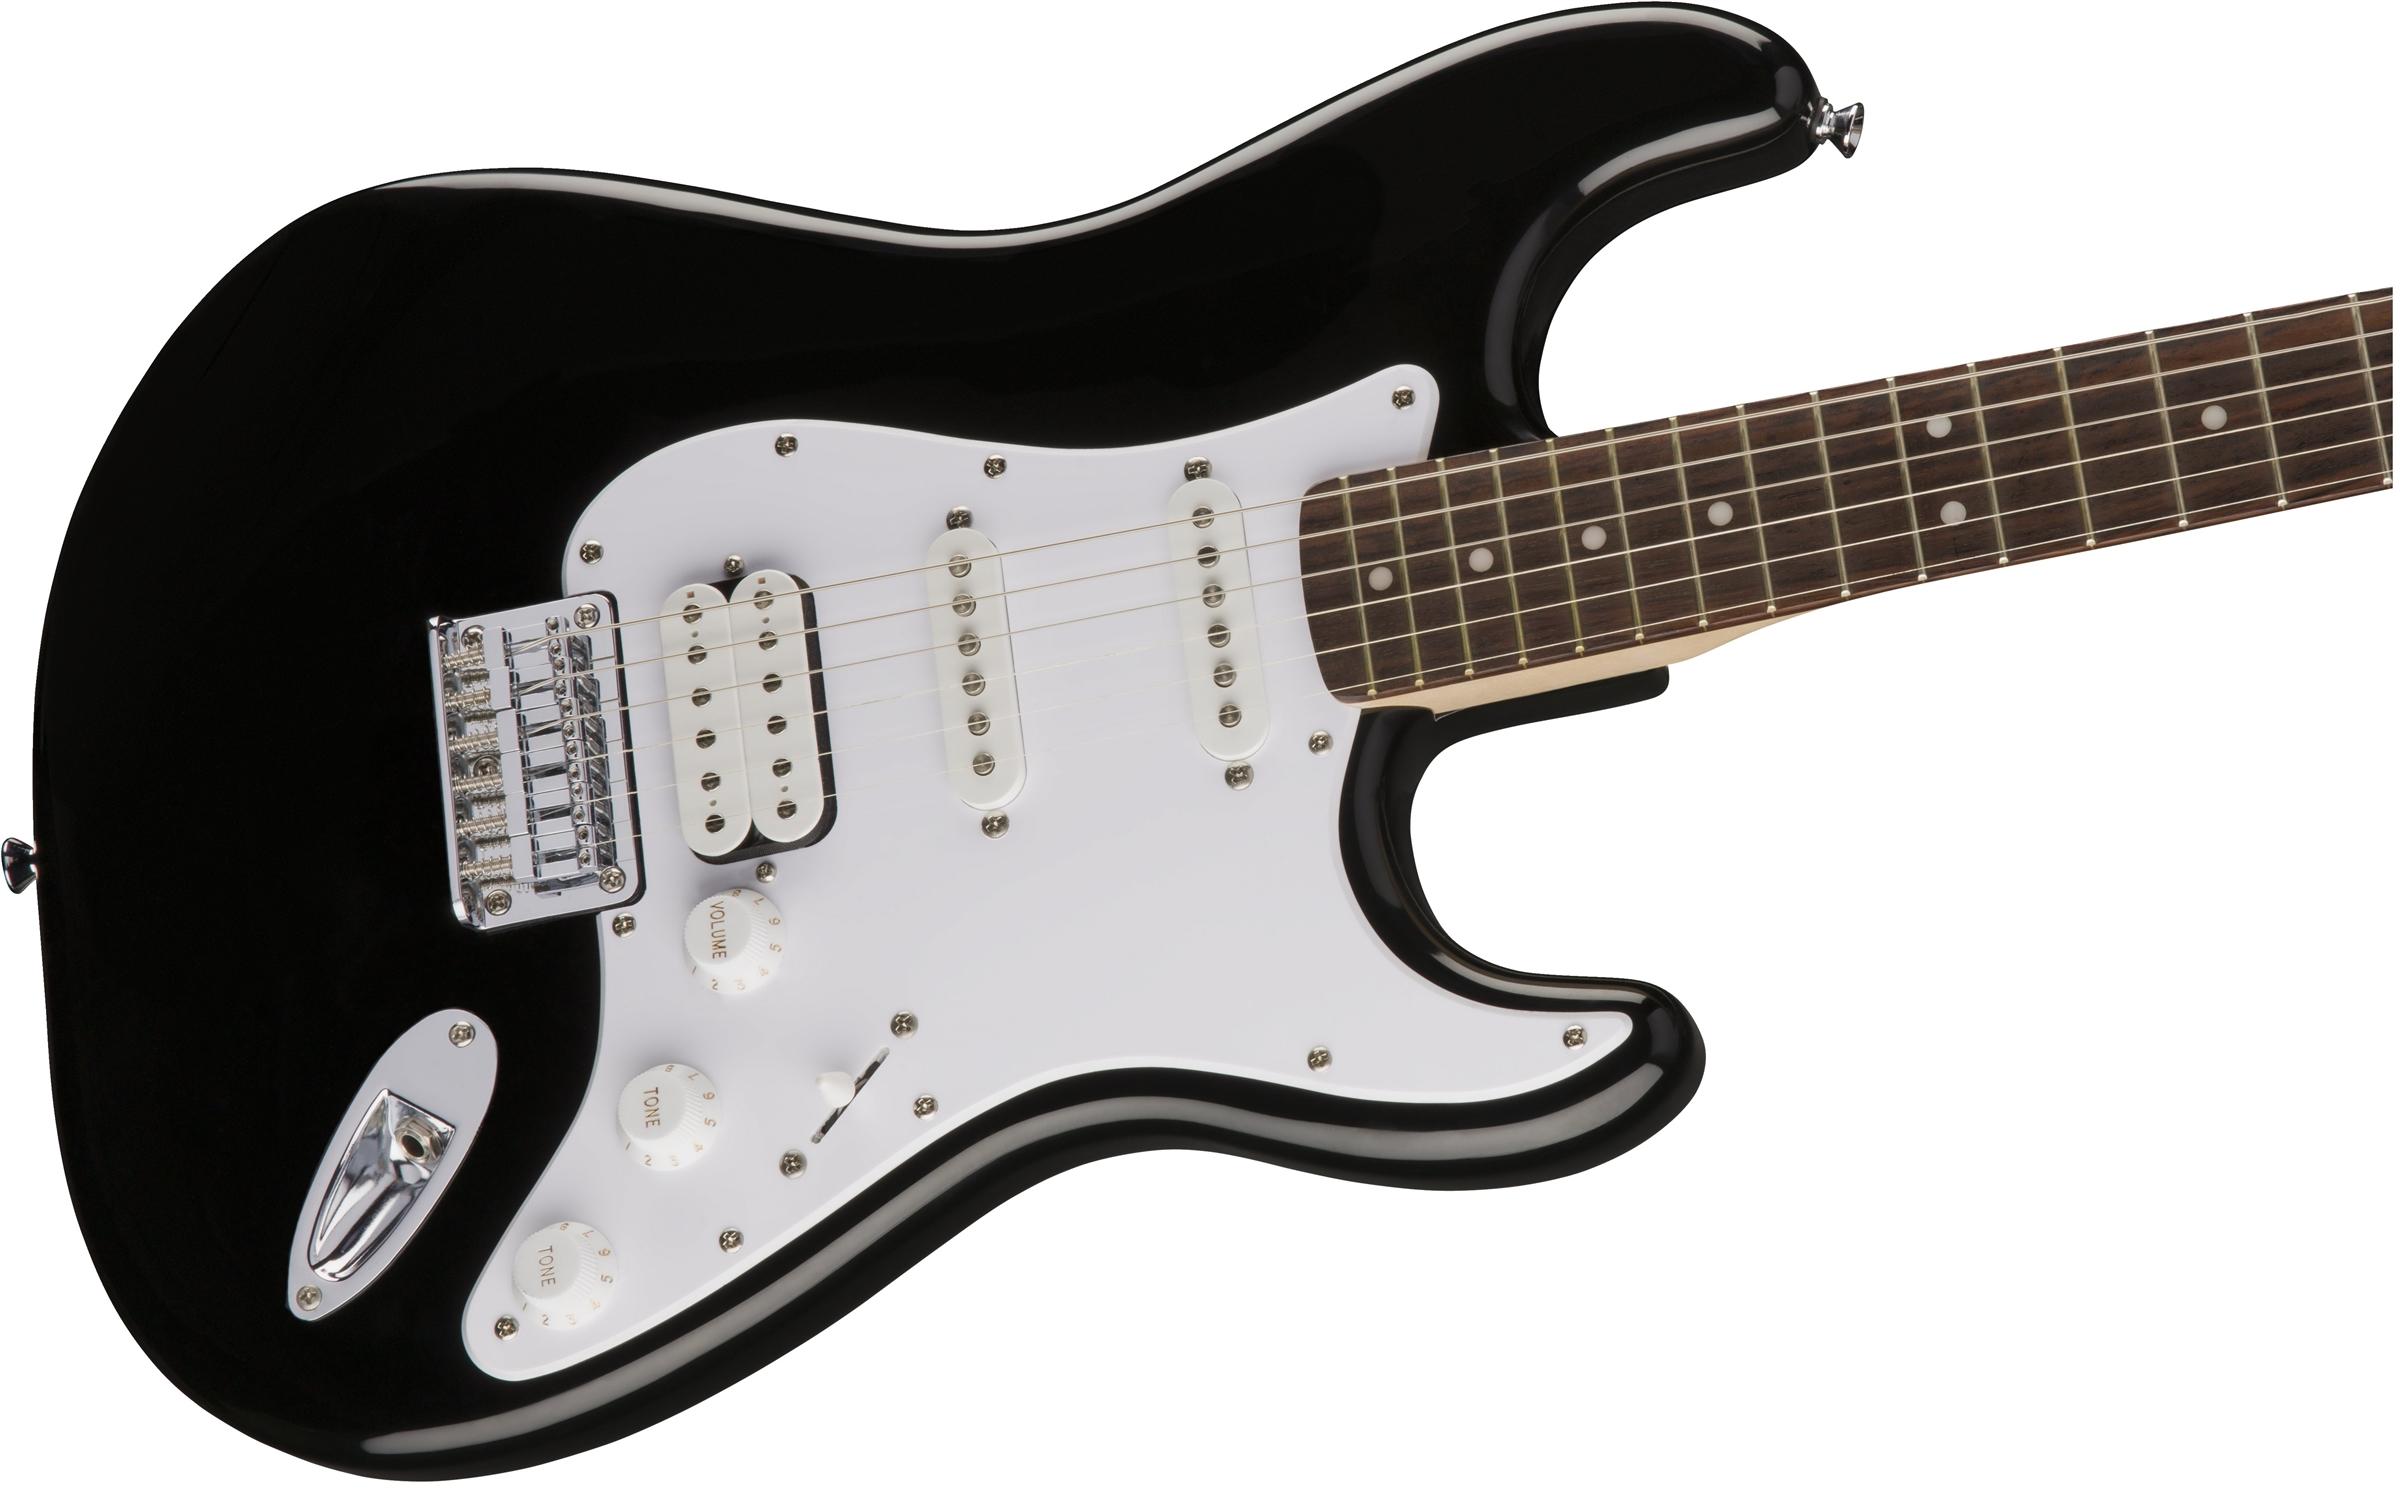 guitare electrique fender squier bullet strat hss rw bsb